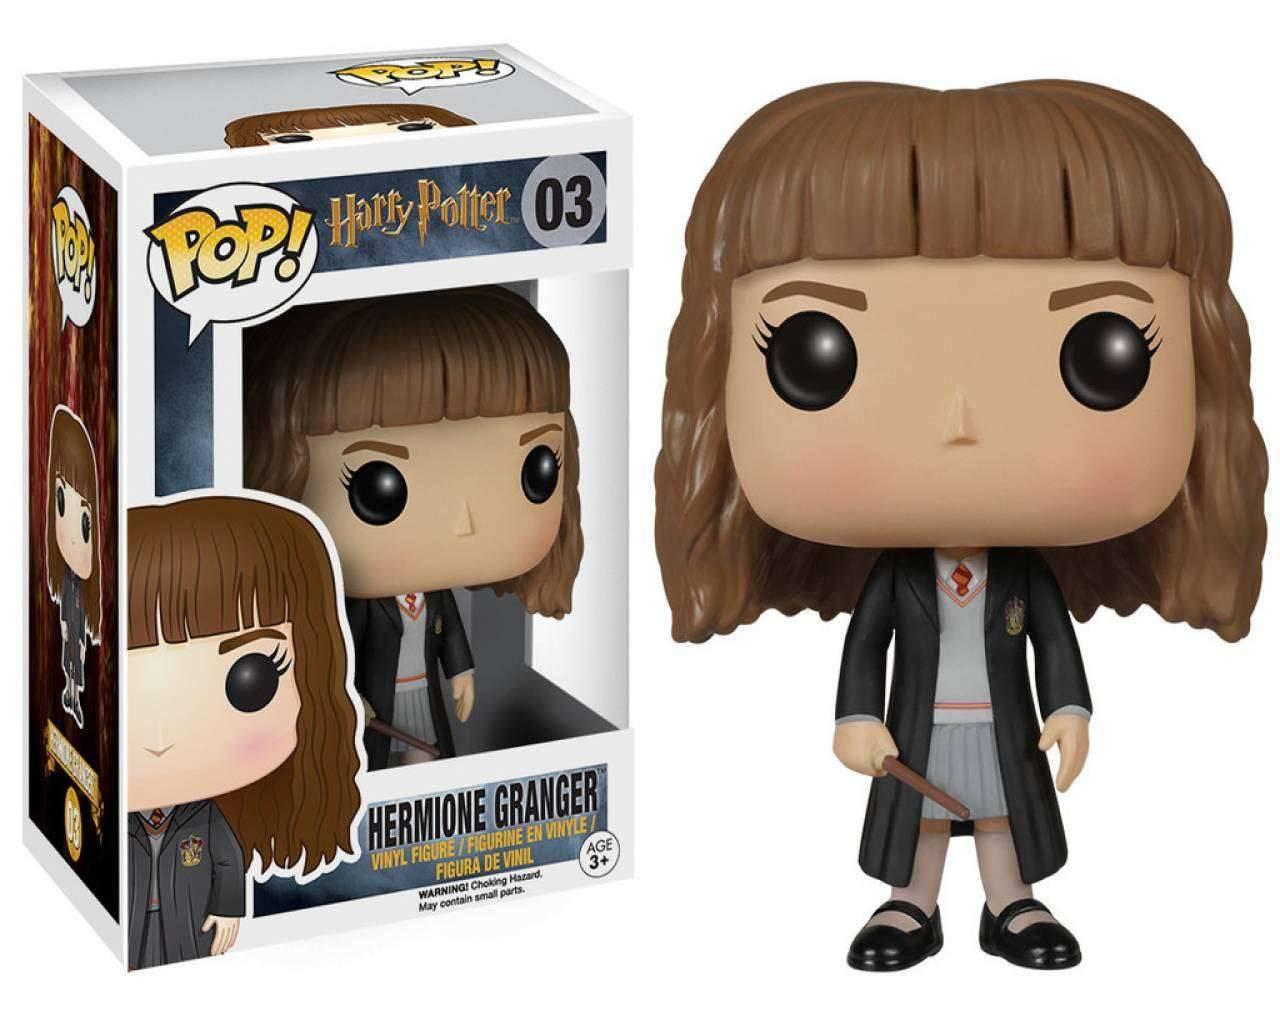 Hermione Granger Pop! Vinyl